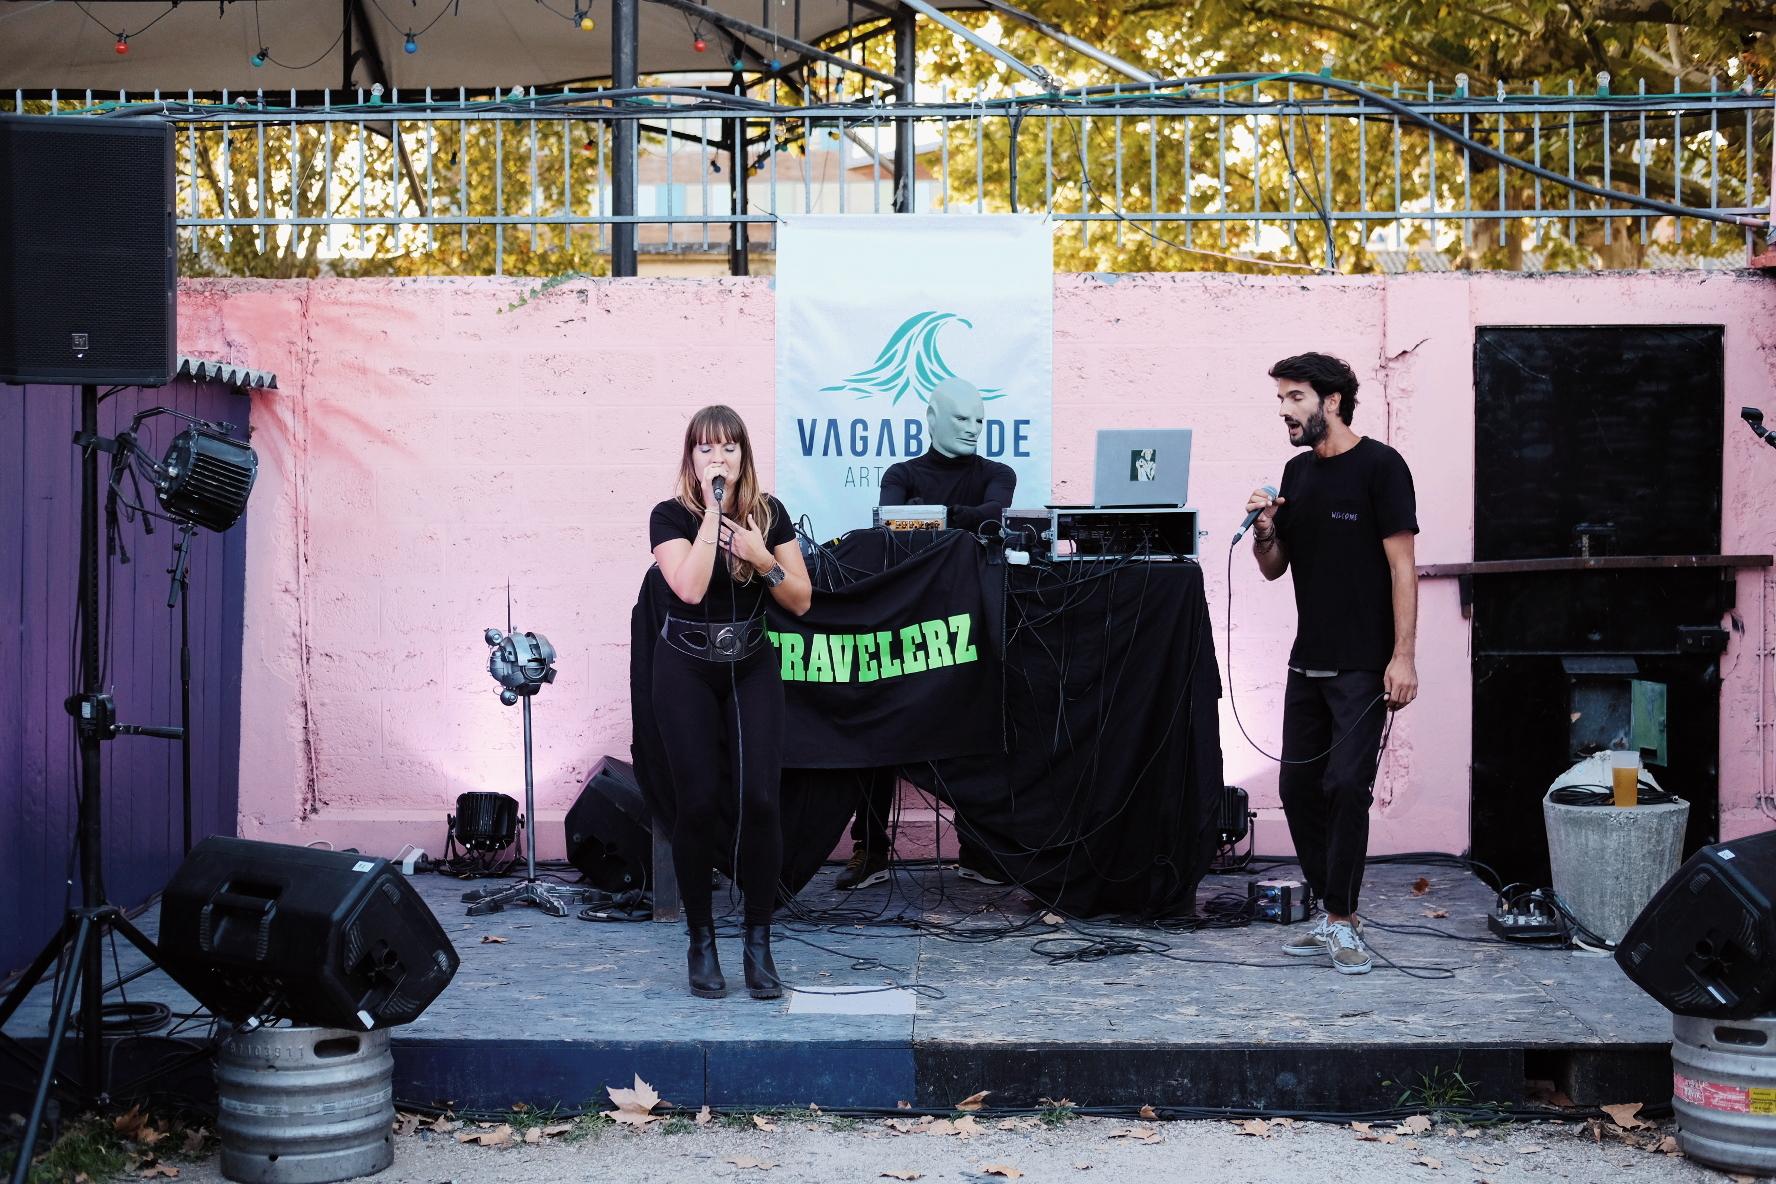 2018 09 29 Festival Vagabonde